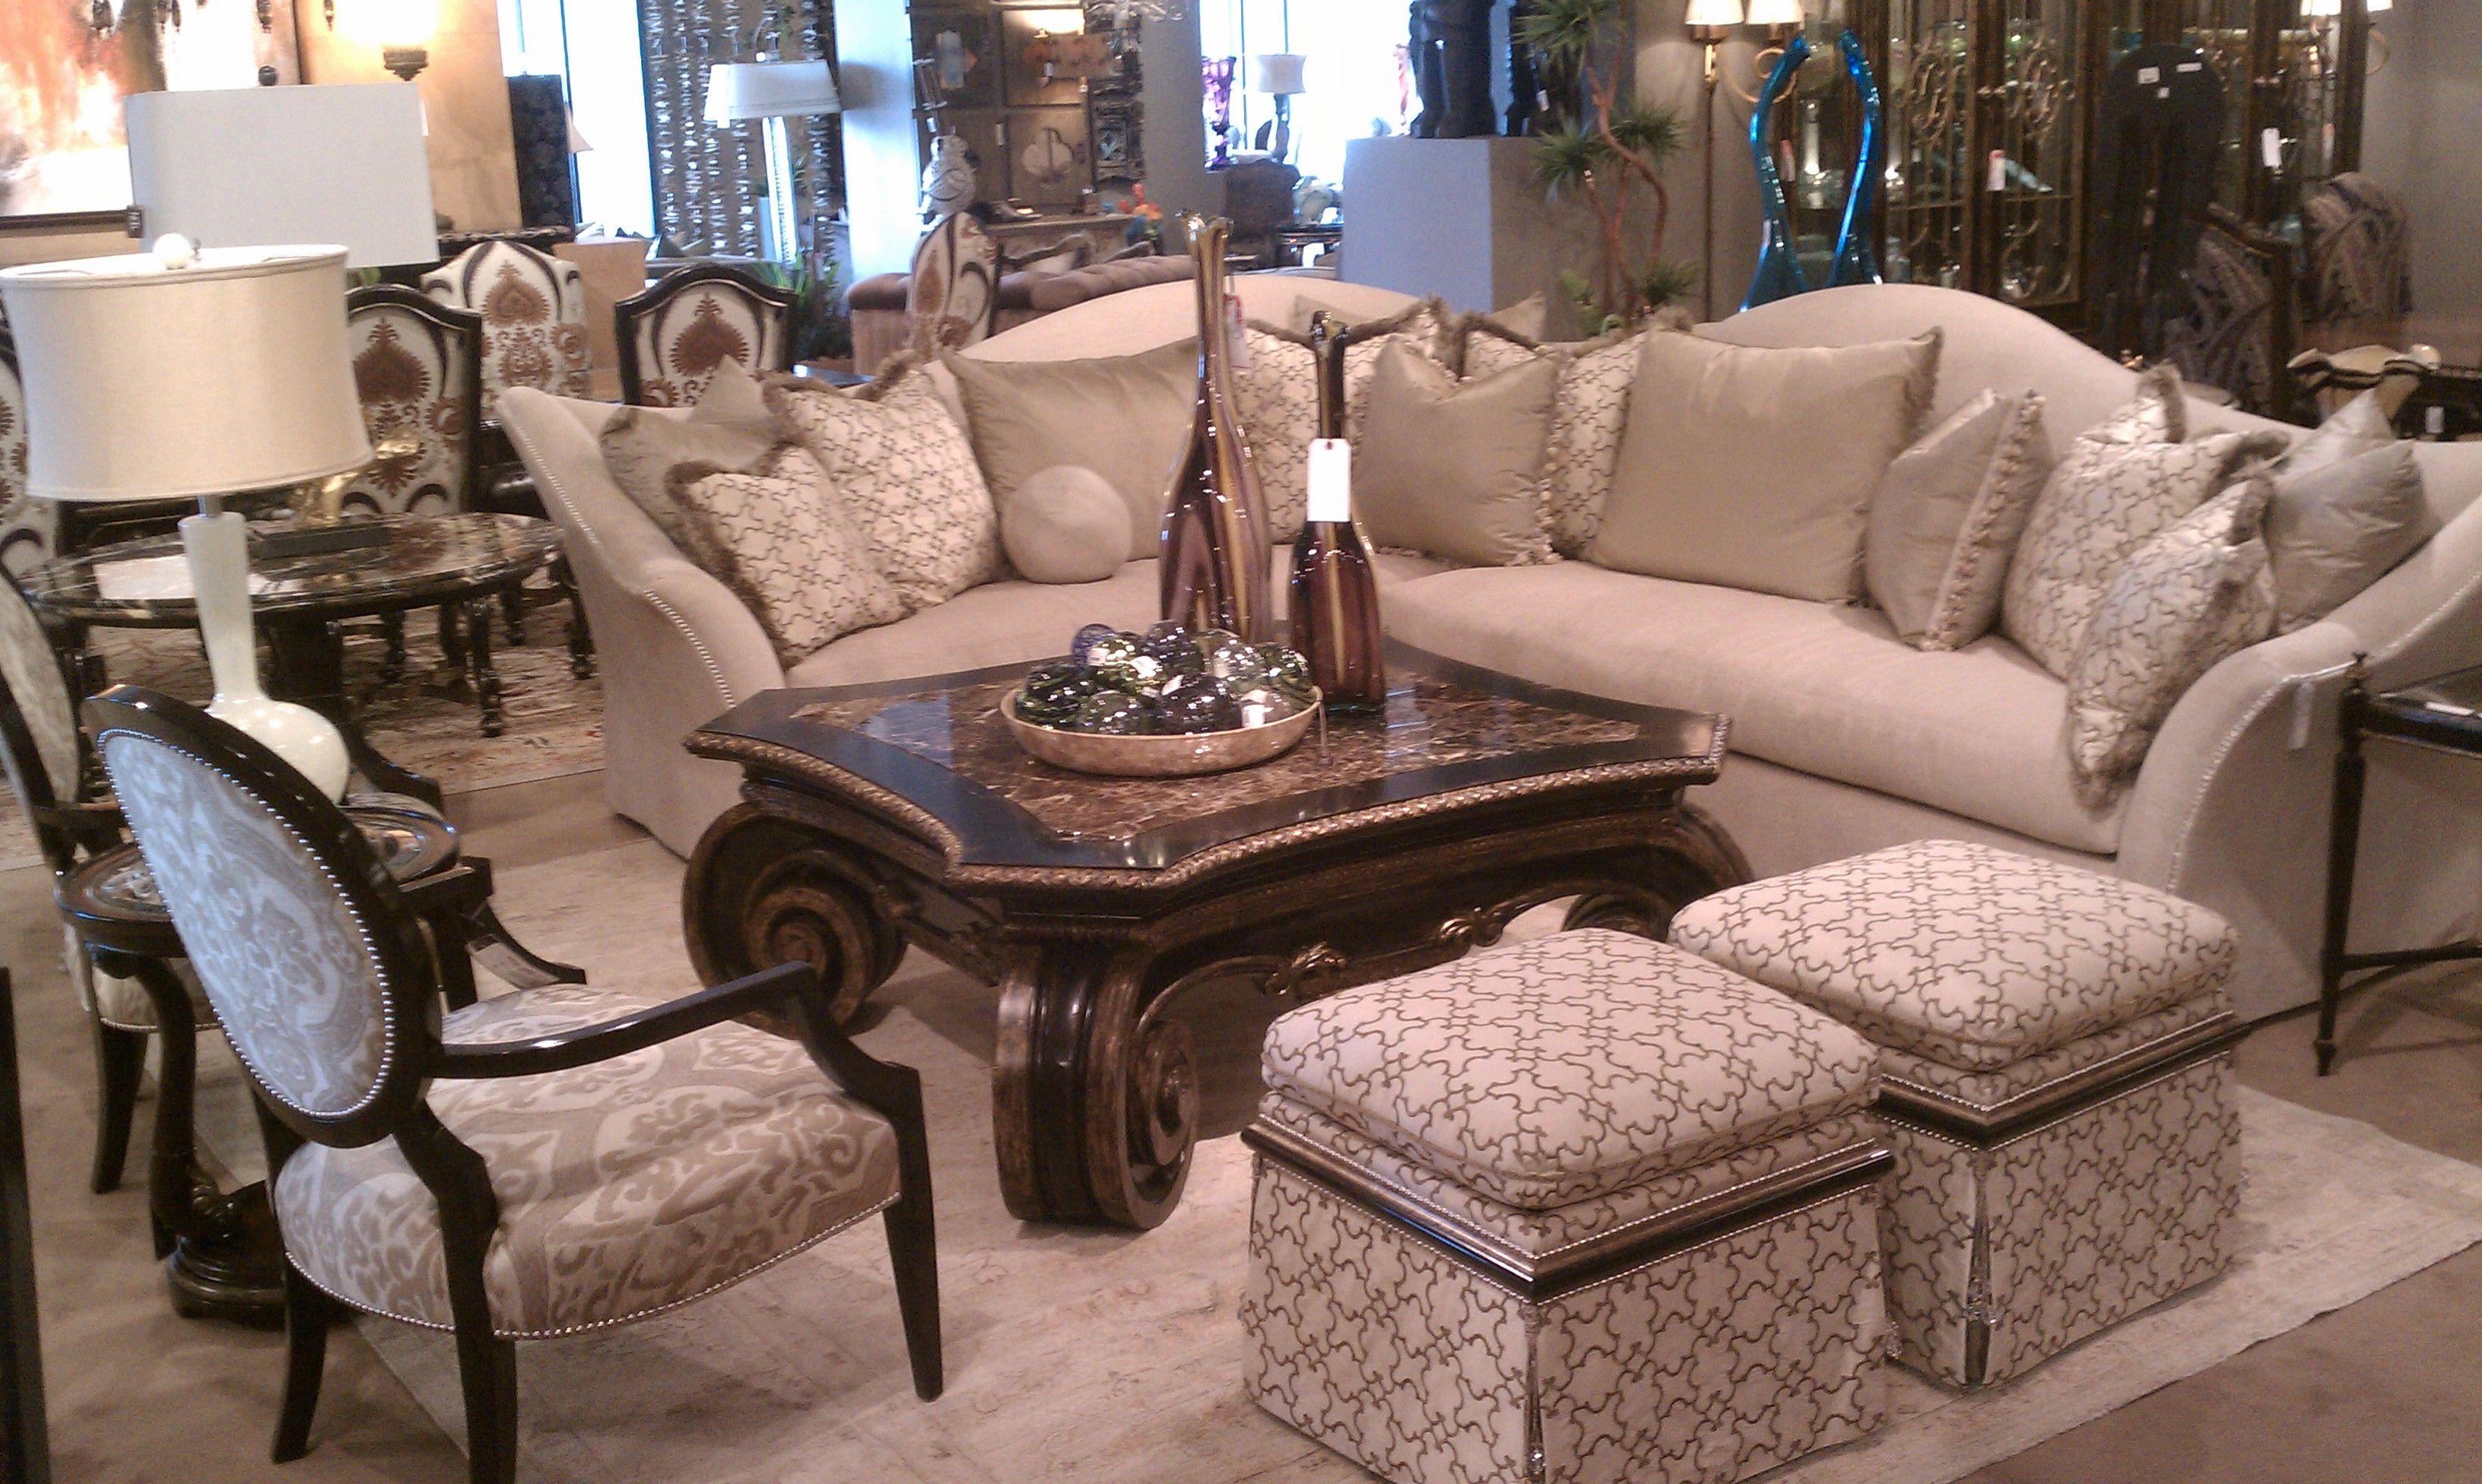 noel furniture interior design houston tx marge carson noel